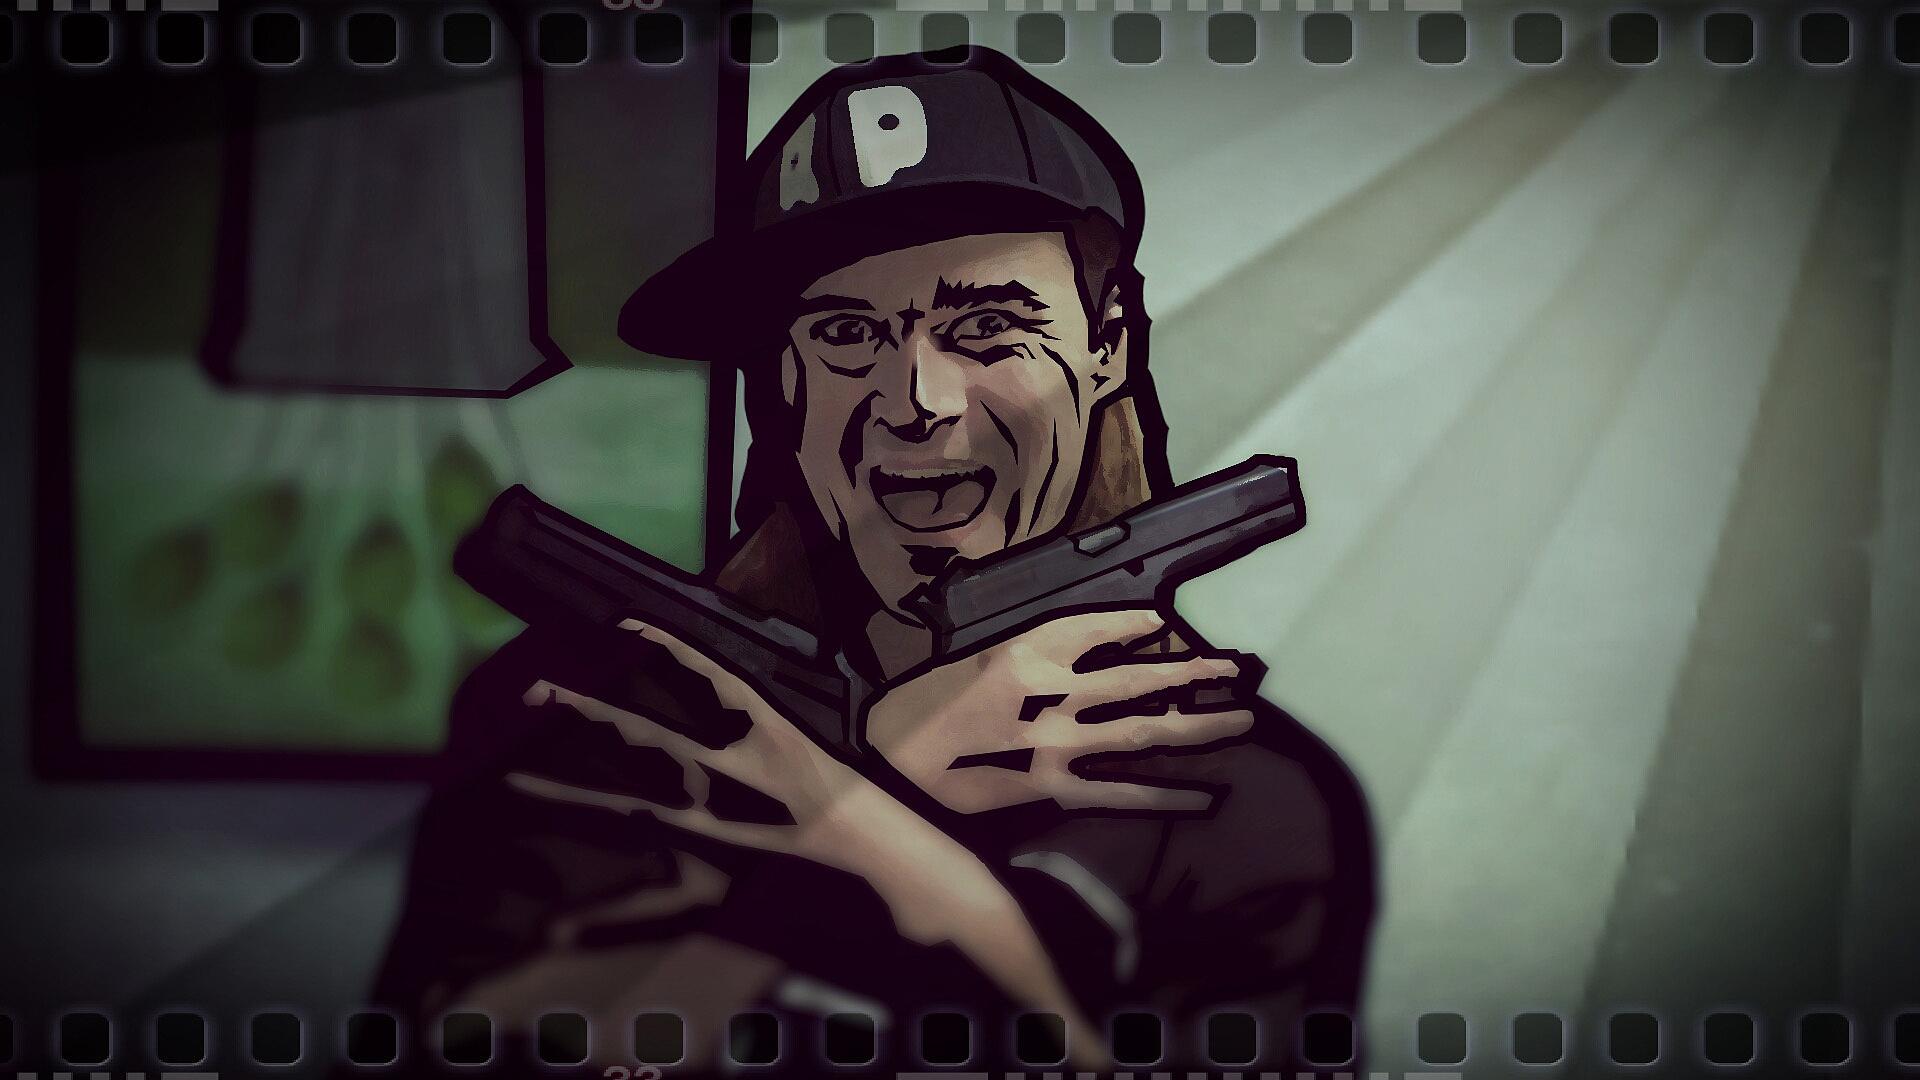 The Undrawn - Bulletproof